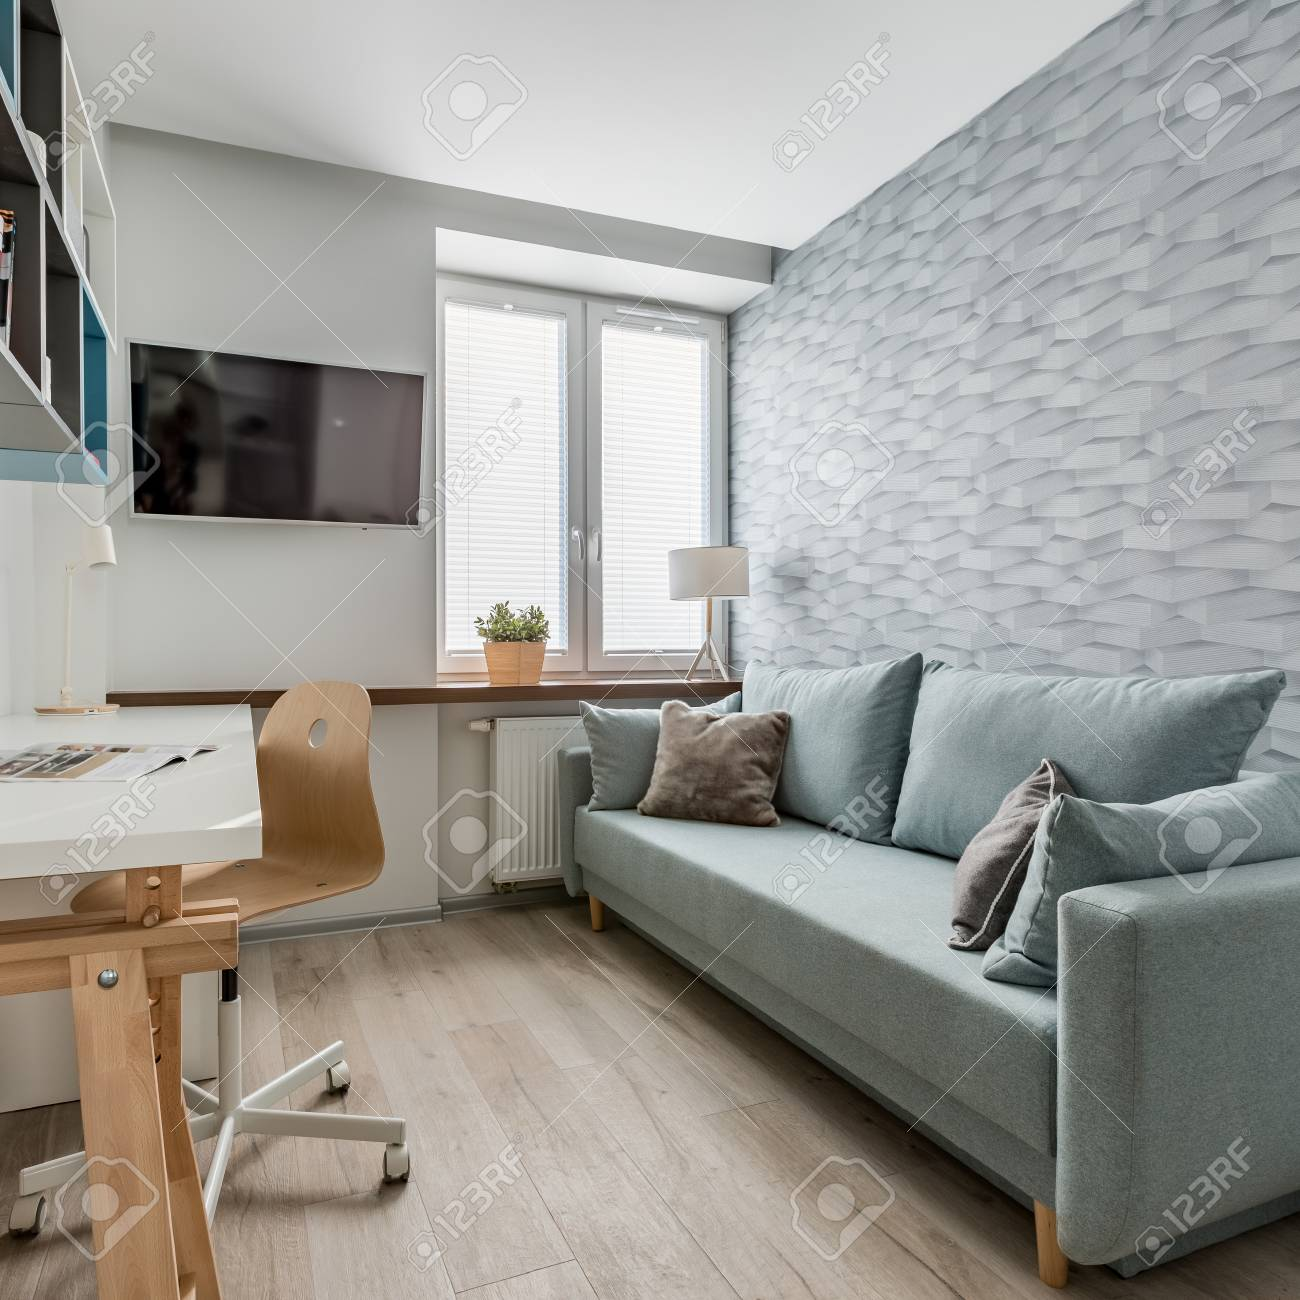 Study Room With Sofa And Modern 3d Wallpaper Lizenzfreie Fotos